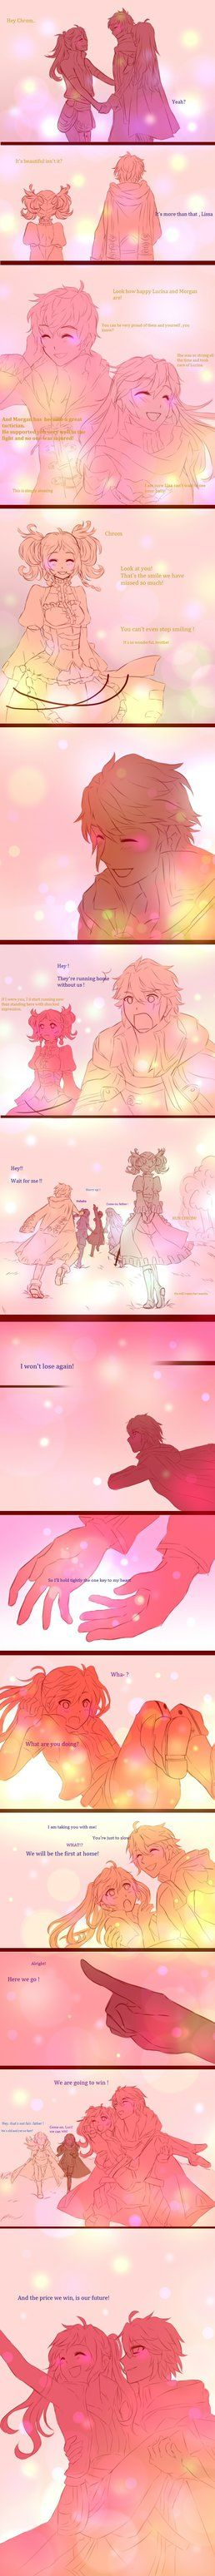 Animal crossing new leaf by tsubaki akia on deviantart - Fire Emblem Awakening The End Part 7 By Owllisa On Deviantart